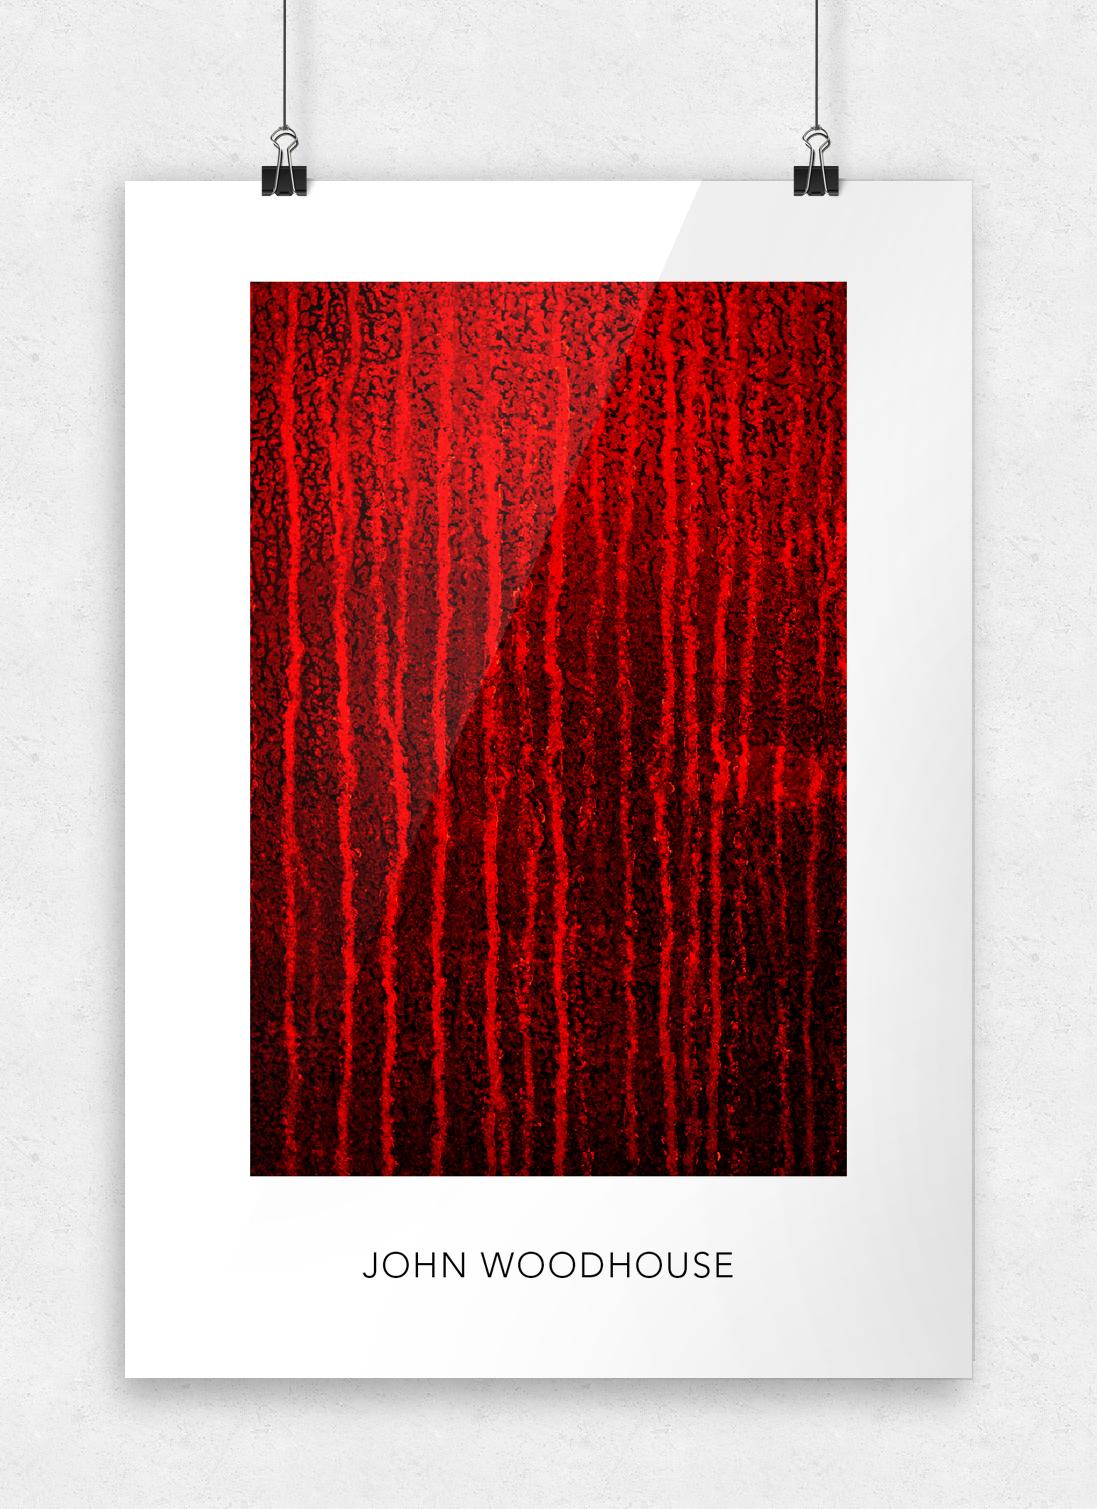 JW-Posters-Template_11.jpg